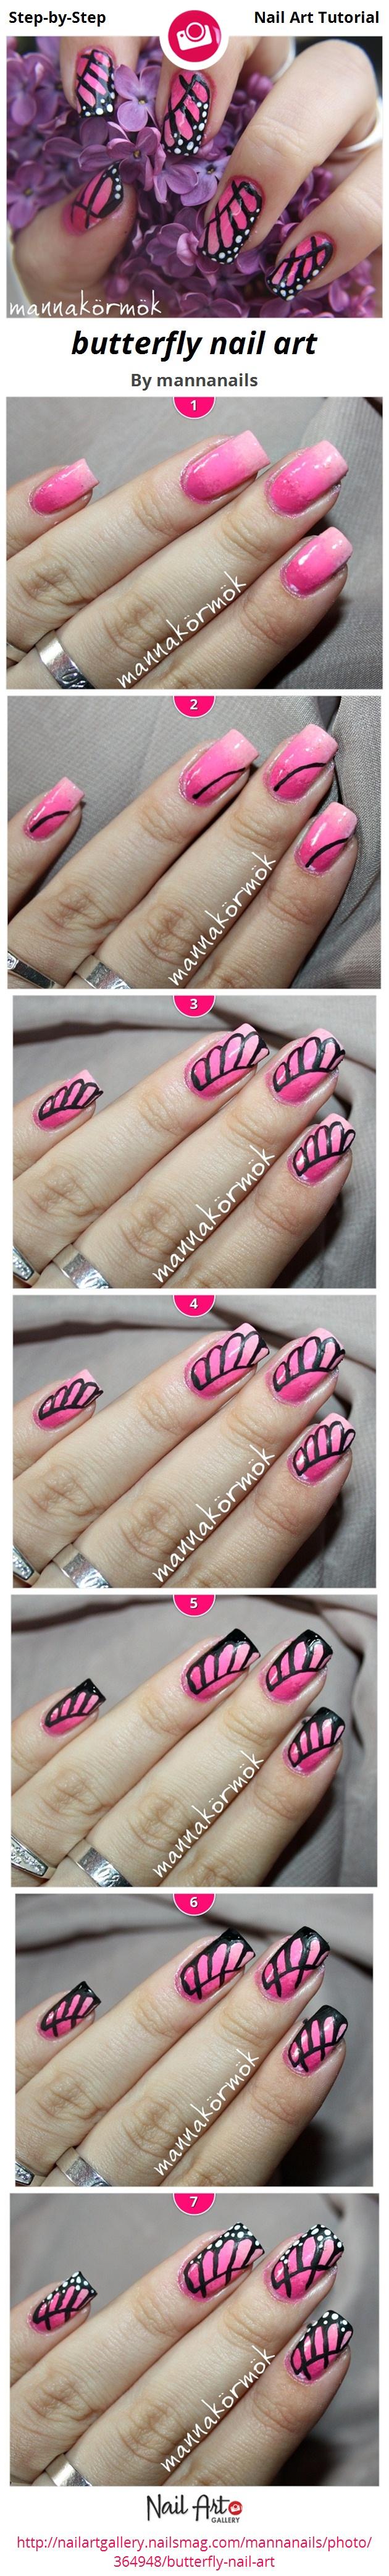 butterfly nail art - Nail Art Gallery